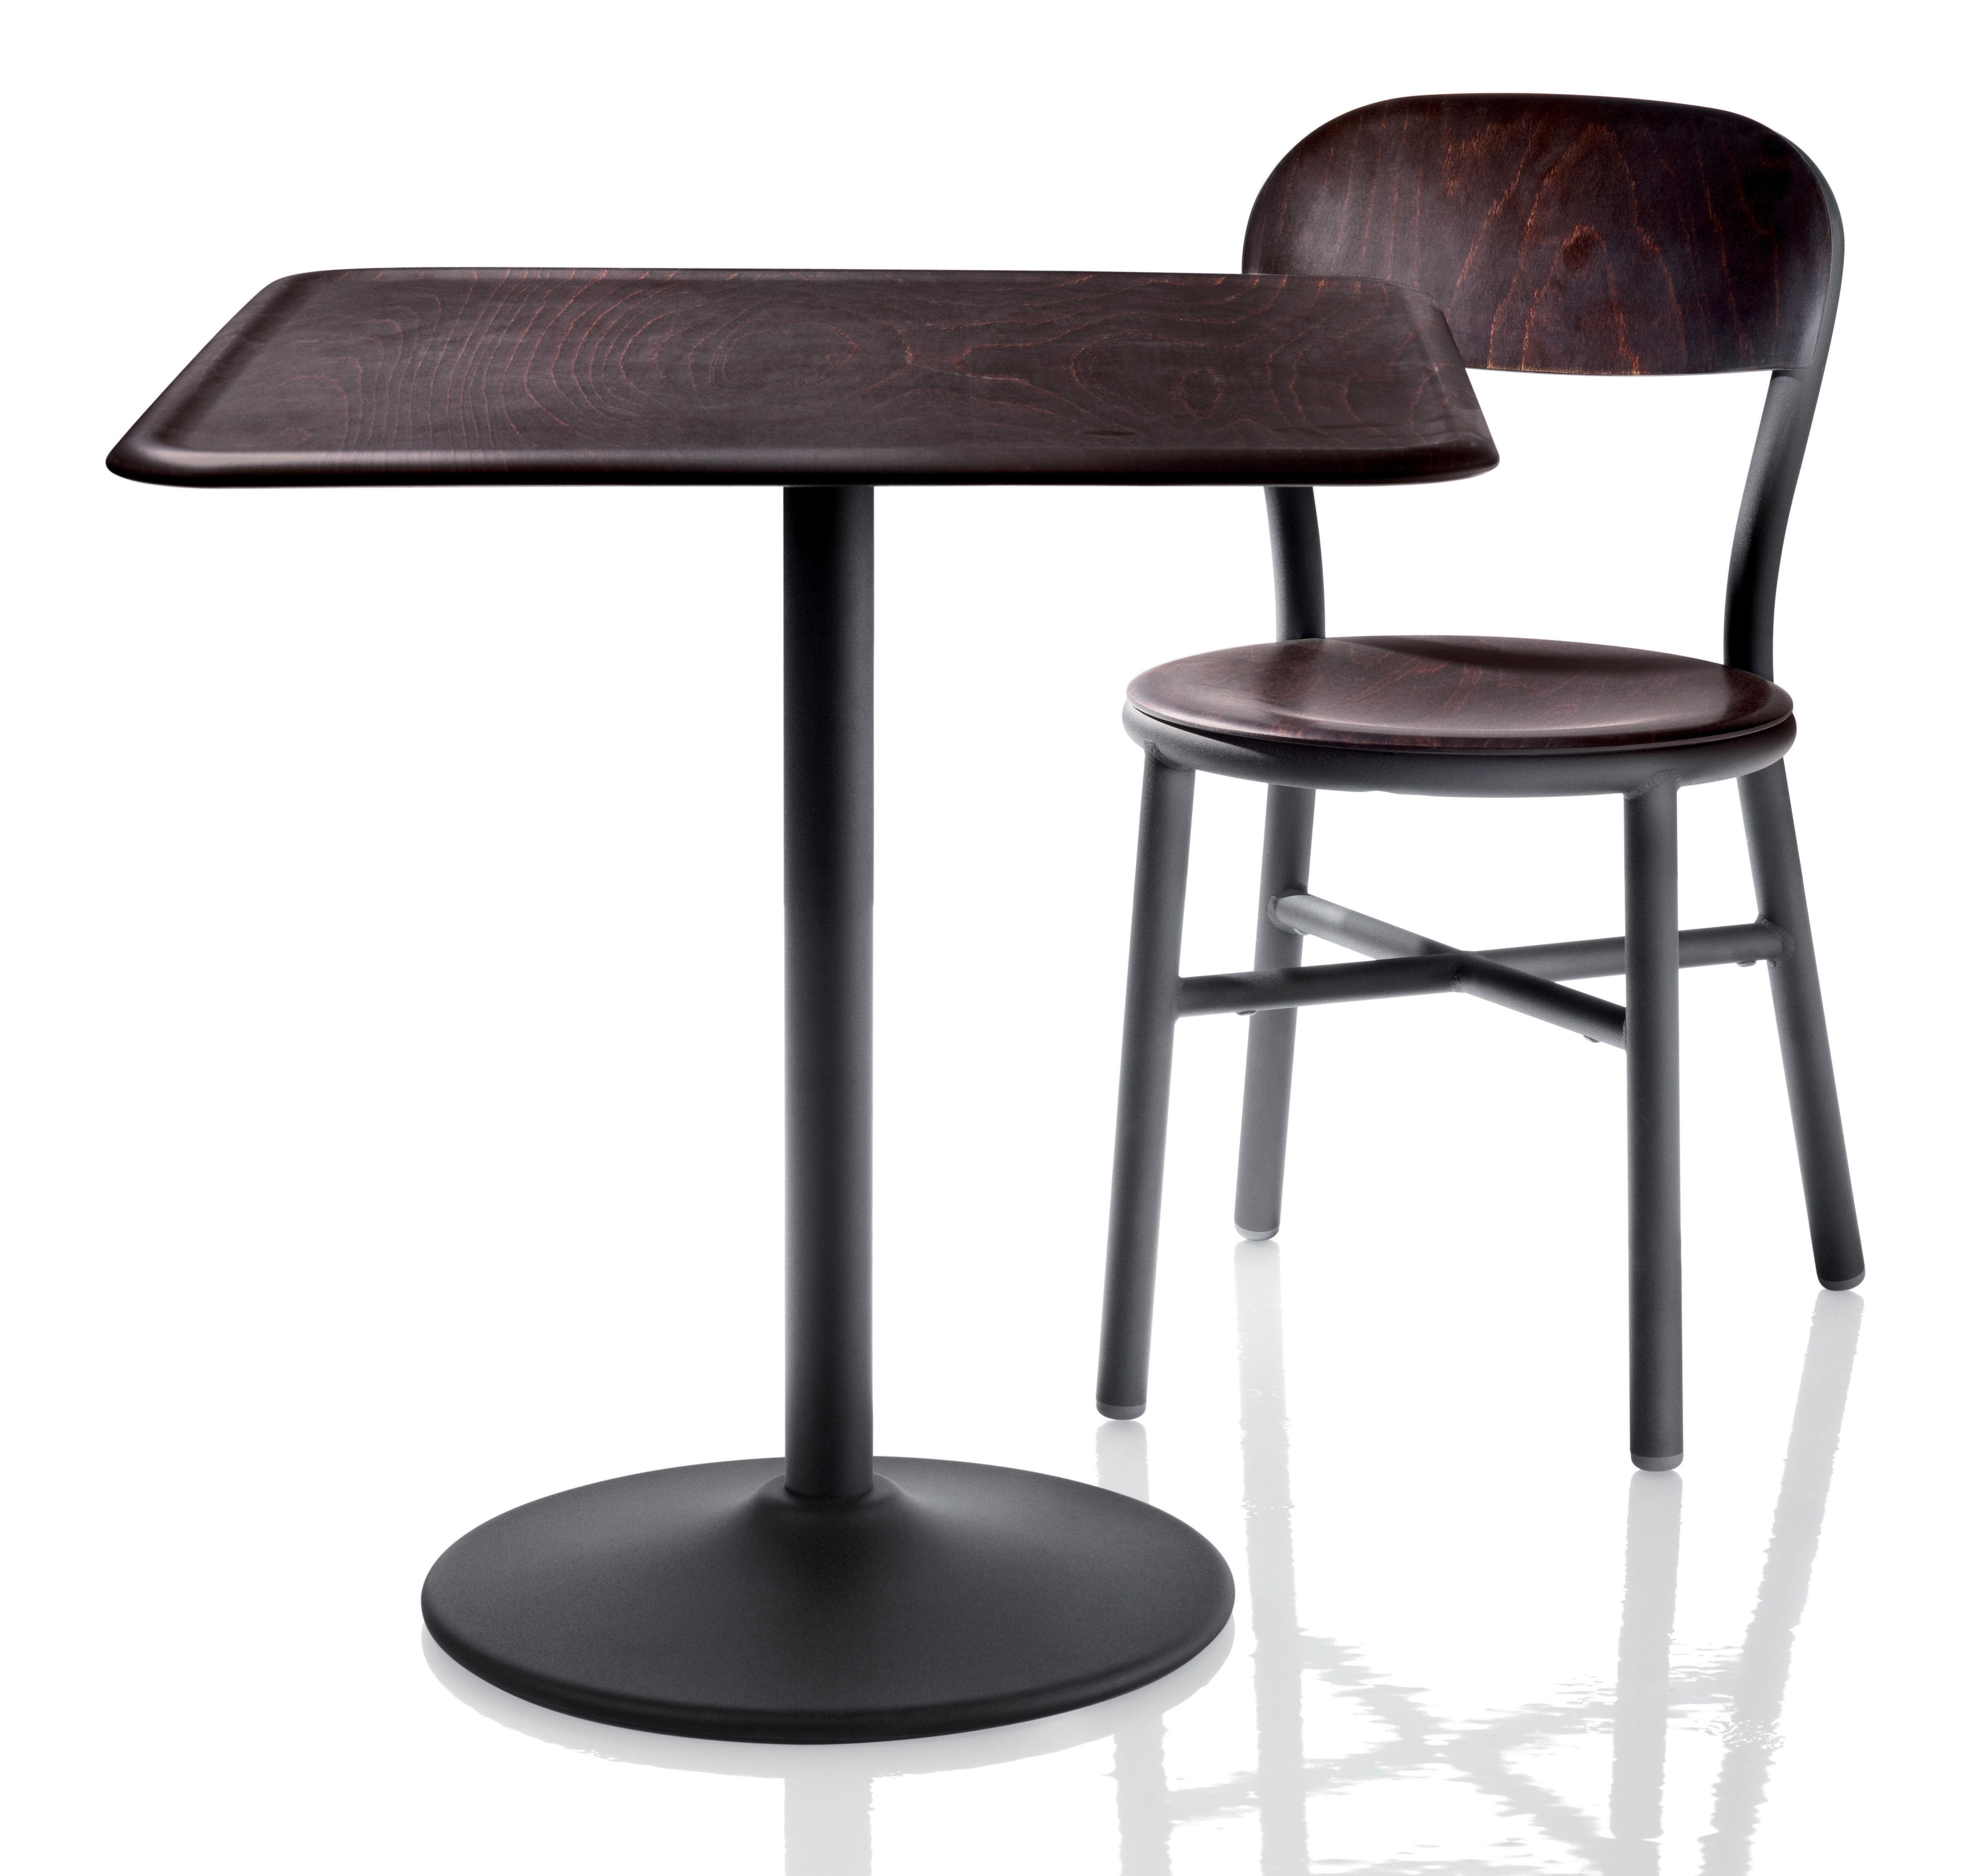 chaise empilable pipe bois m tal blanc h tre naturel. Black Bedroom Furniture Sets. Home Design Ideas